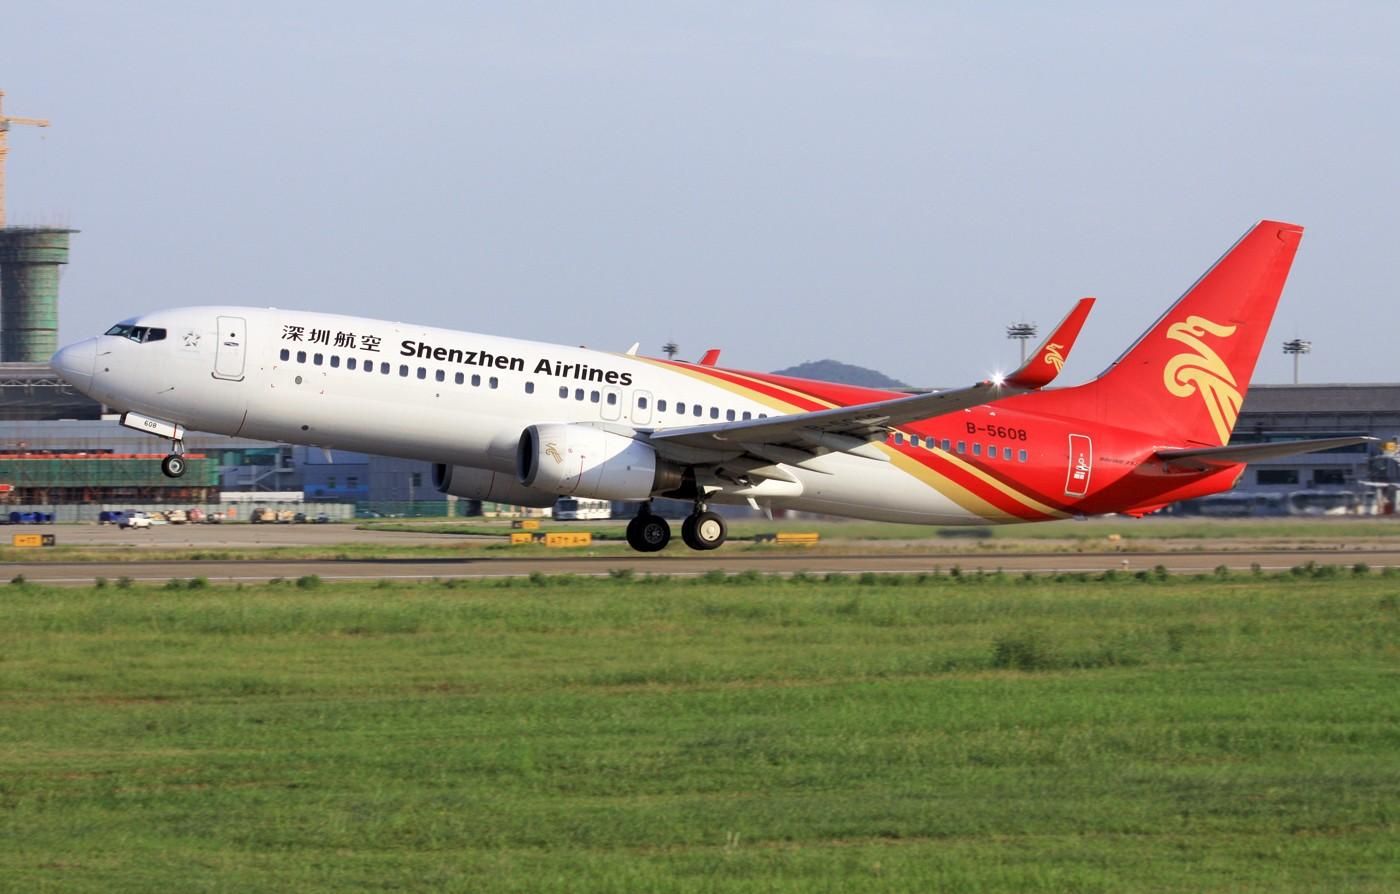 Re:[原创]【小免坚强】谁不说咱南京好,得儿哟依儿哟 BOEING 737-800 B-5608 中国南京禄口机场